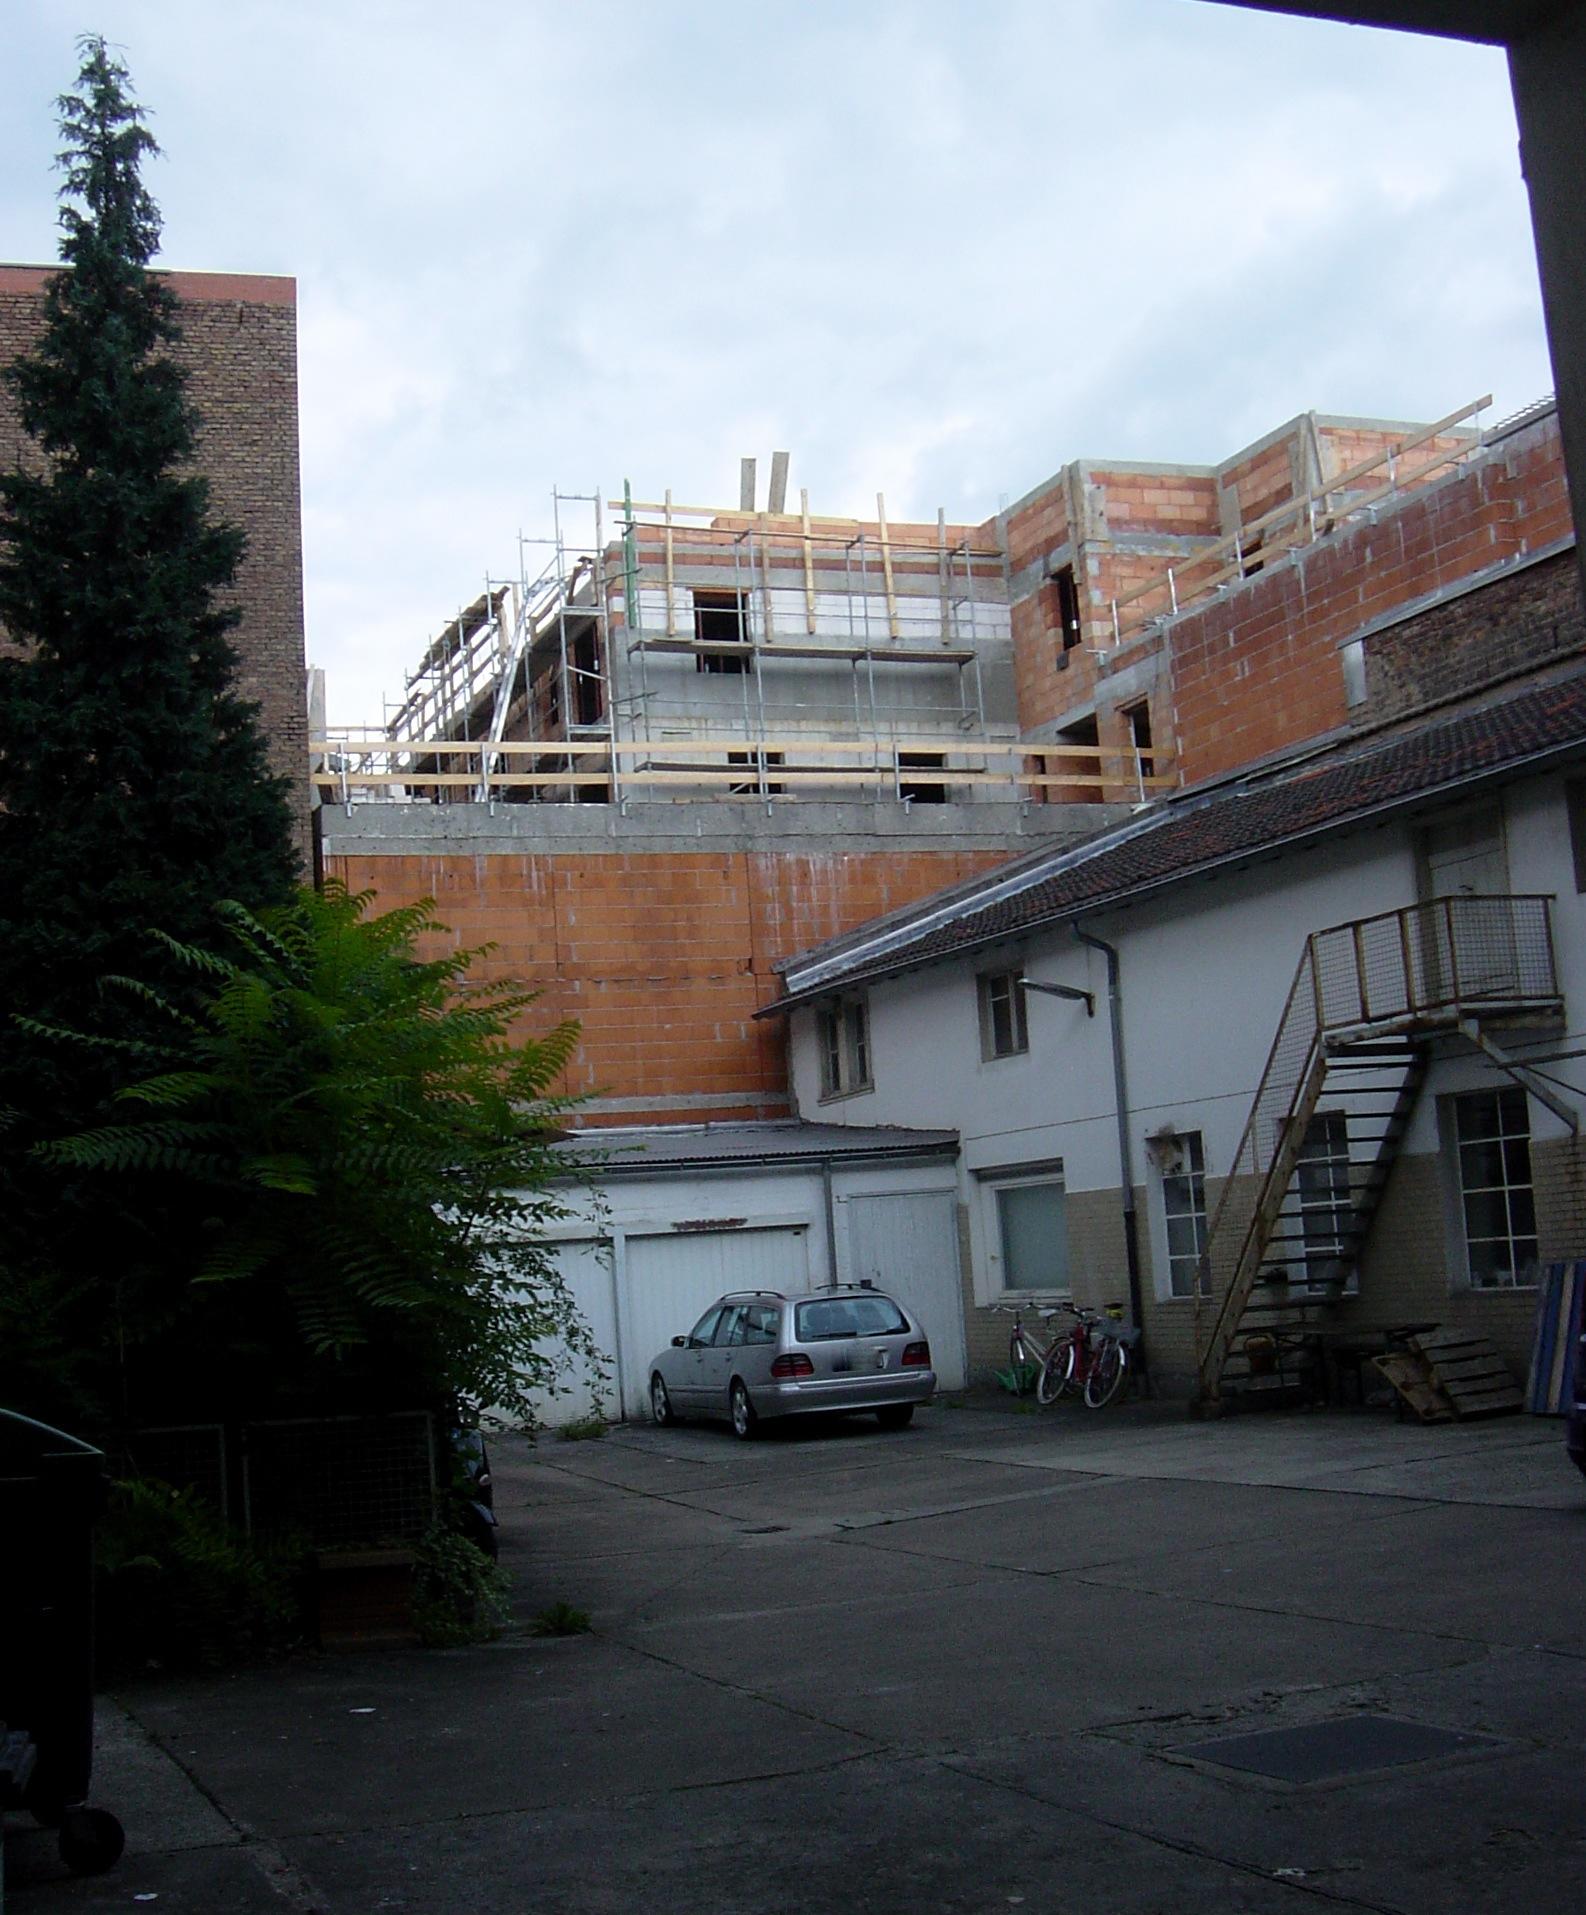 Bild: https://upload.wikimedia.org/wikipedia/commons/c/c6/Frankfurt-Bockenheim_Leipziger_Stra%C3%9Fe_34_F07.jpg